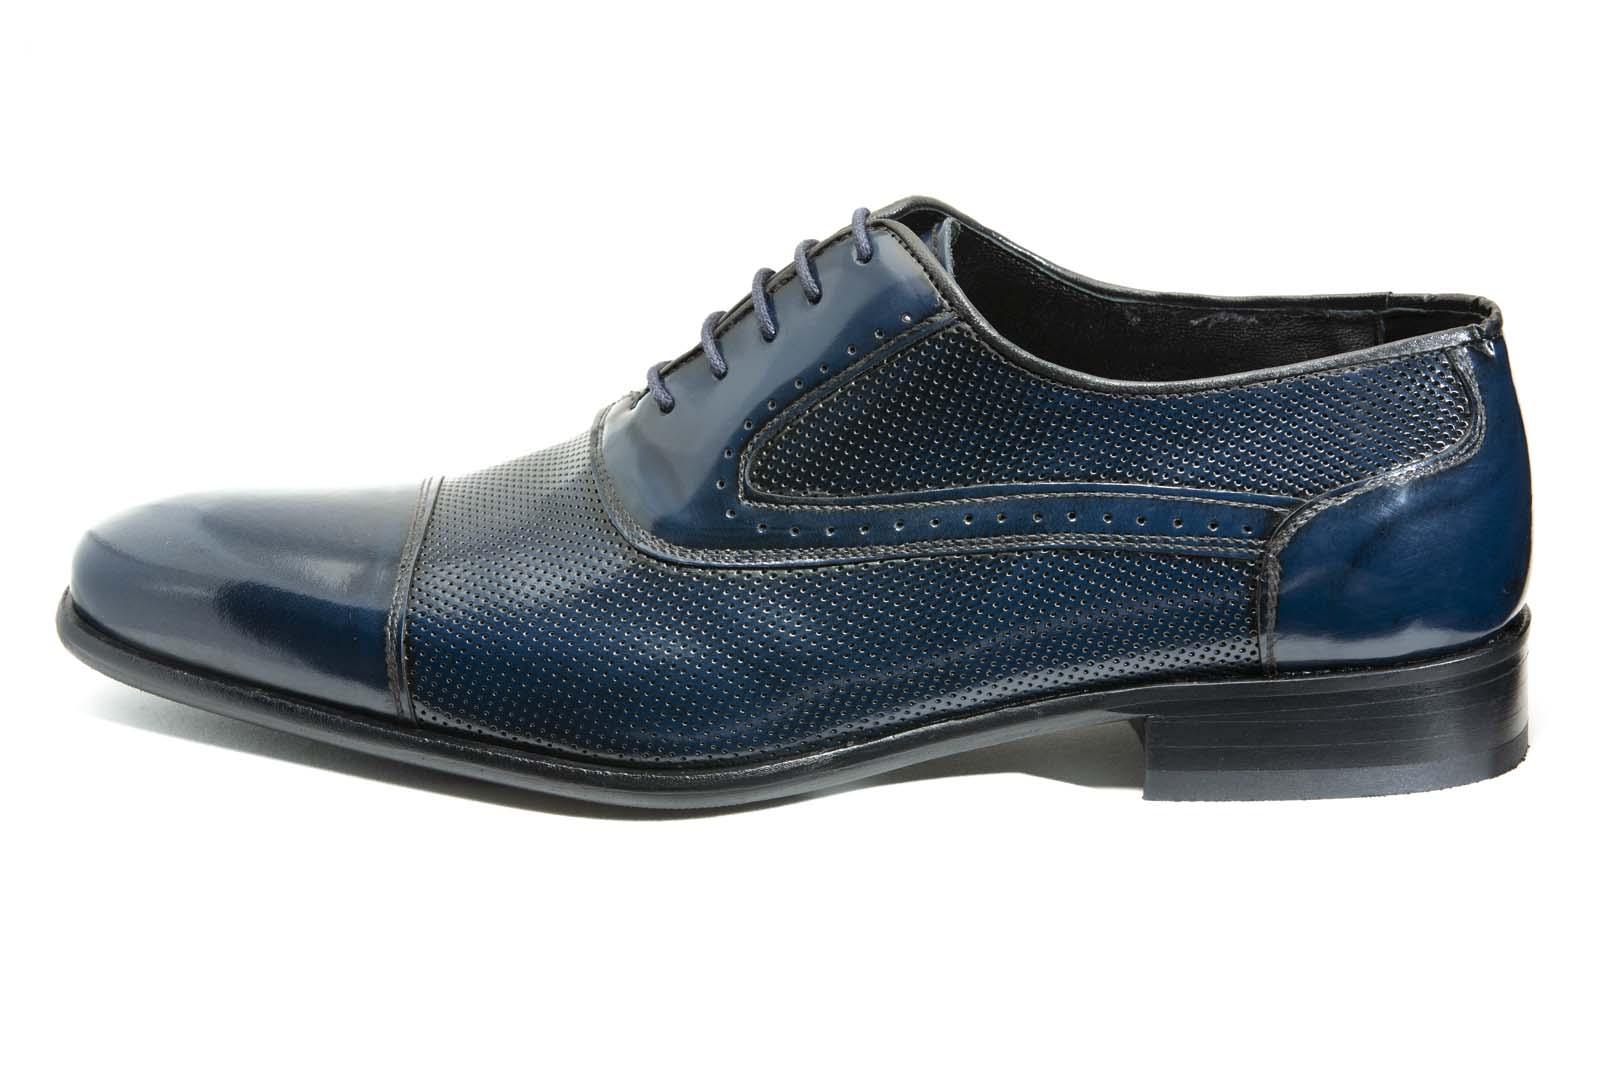 Zapato modelo Oxford con puntera y tapetas lisas al tono